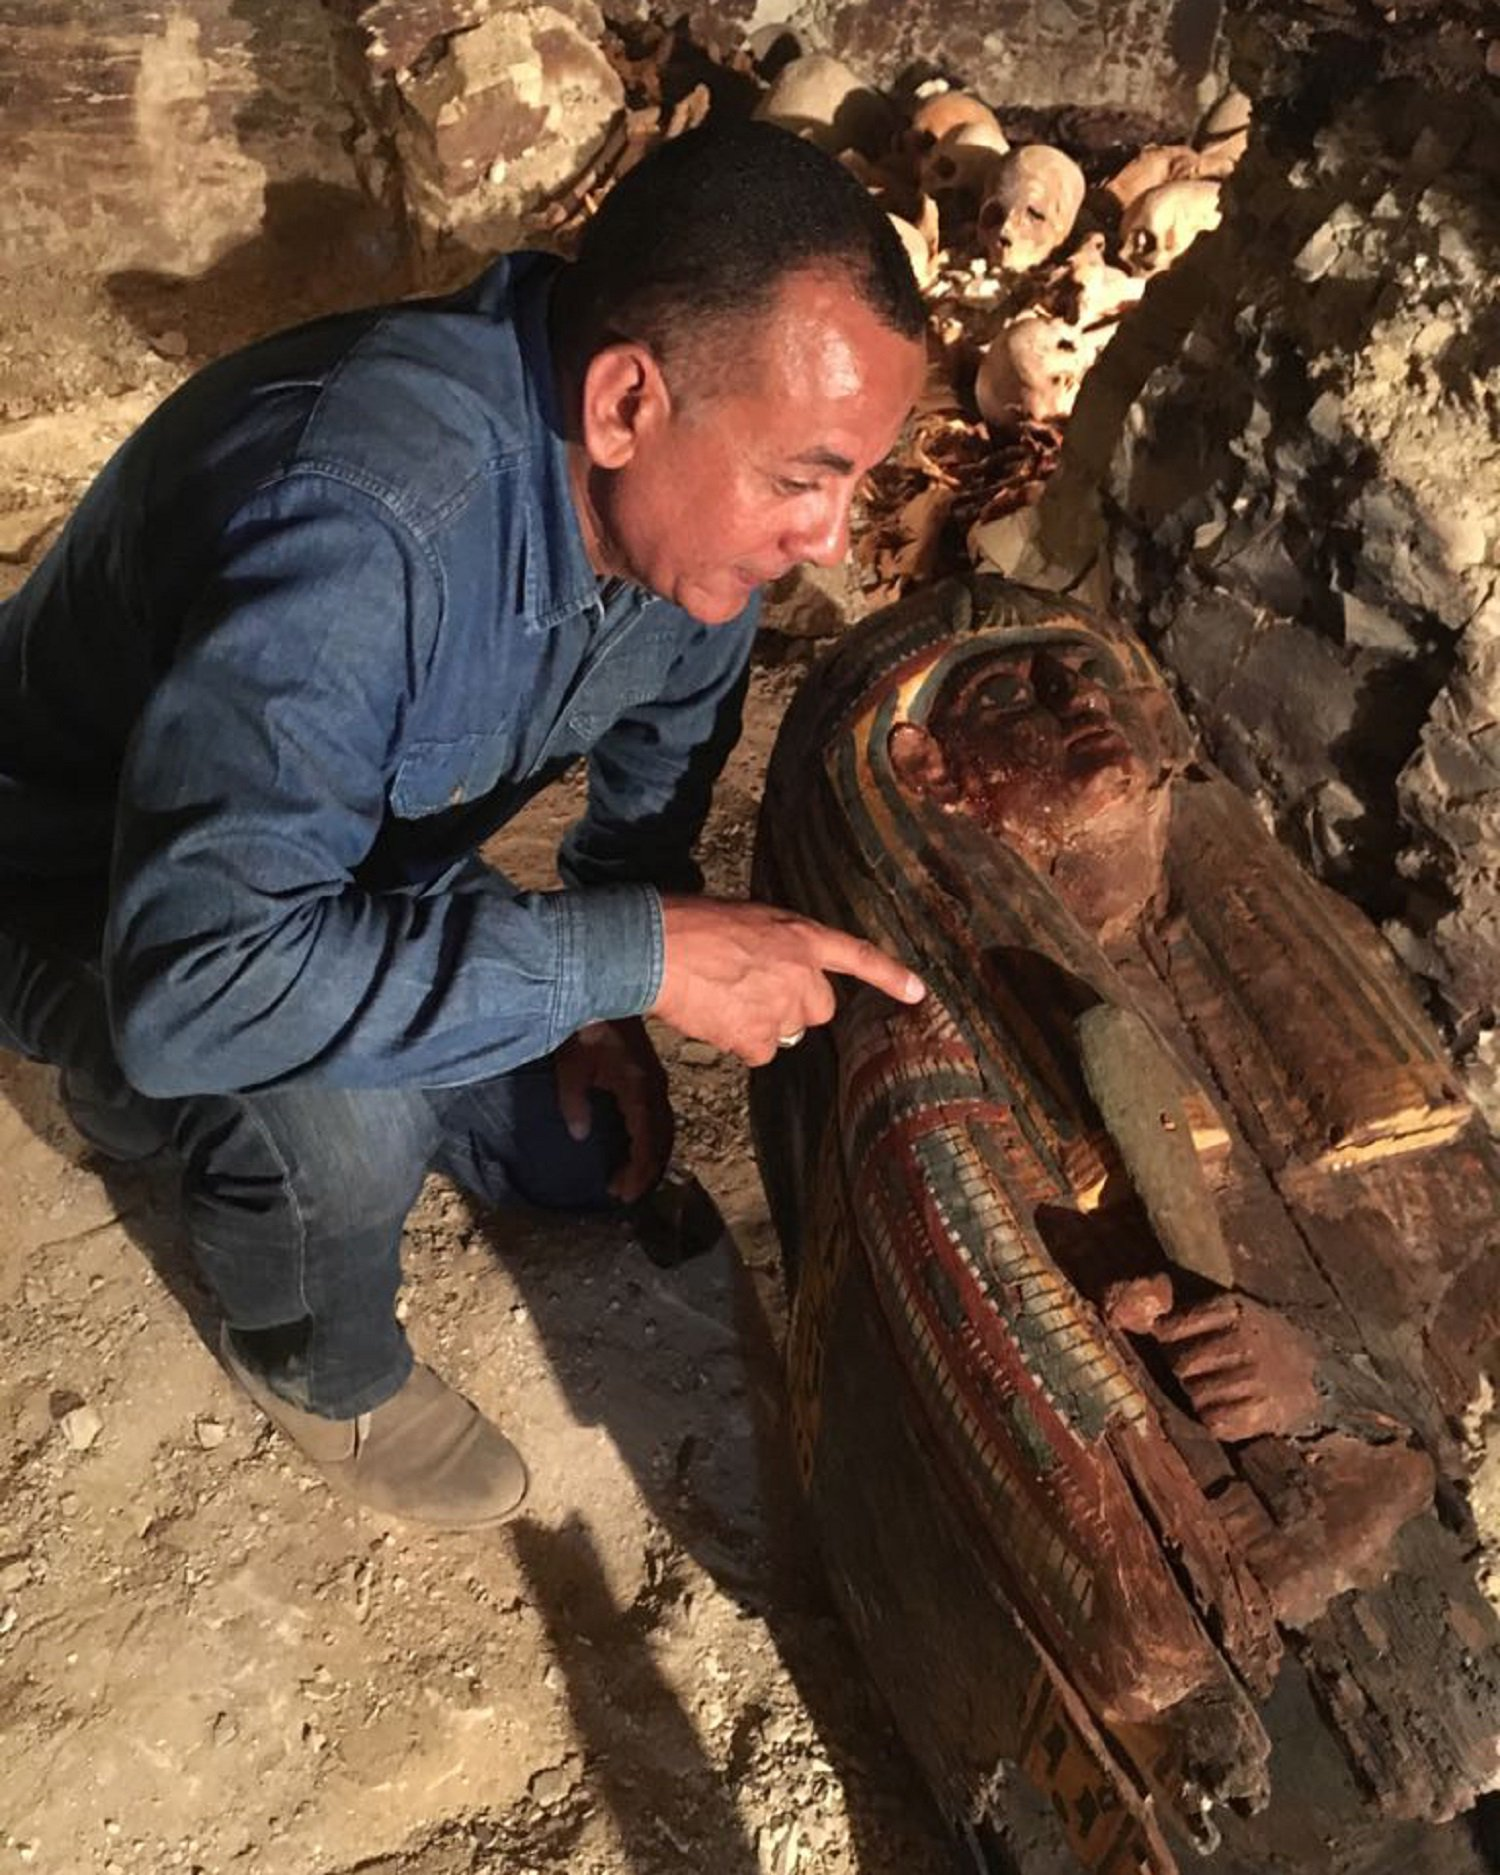 Egypt announces discovery of 3,500-years old tomb in Luxor https://t.co/9hv7e57Gak https://t.co/qOJmgRJBuz